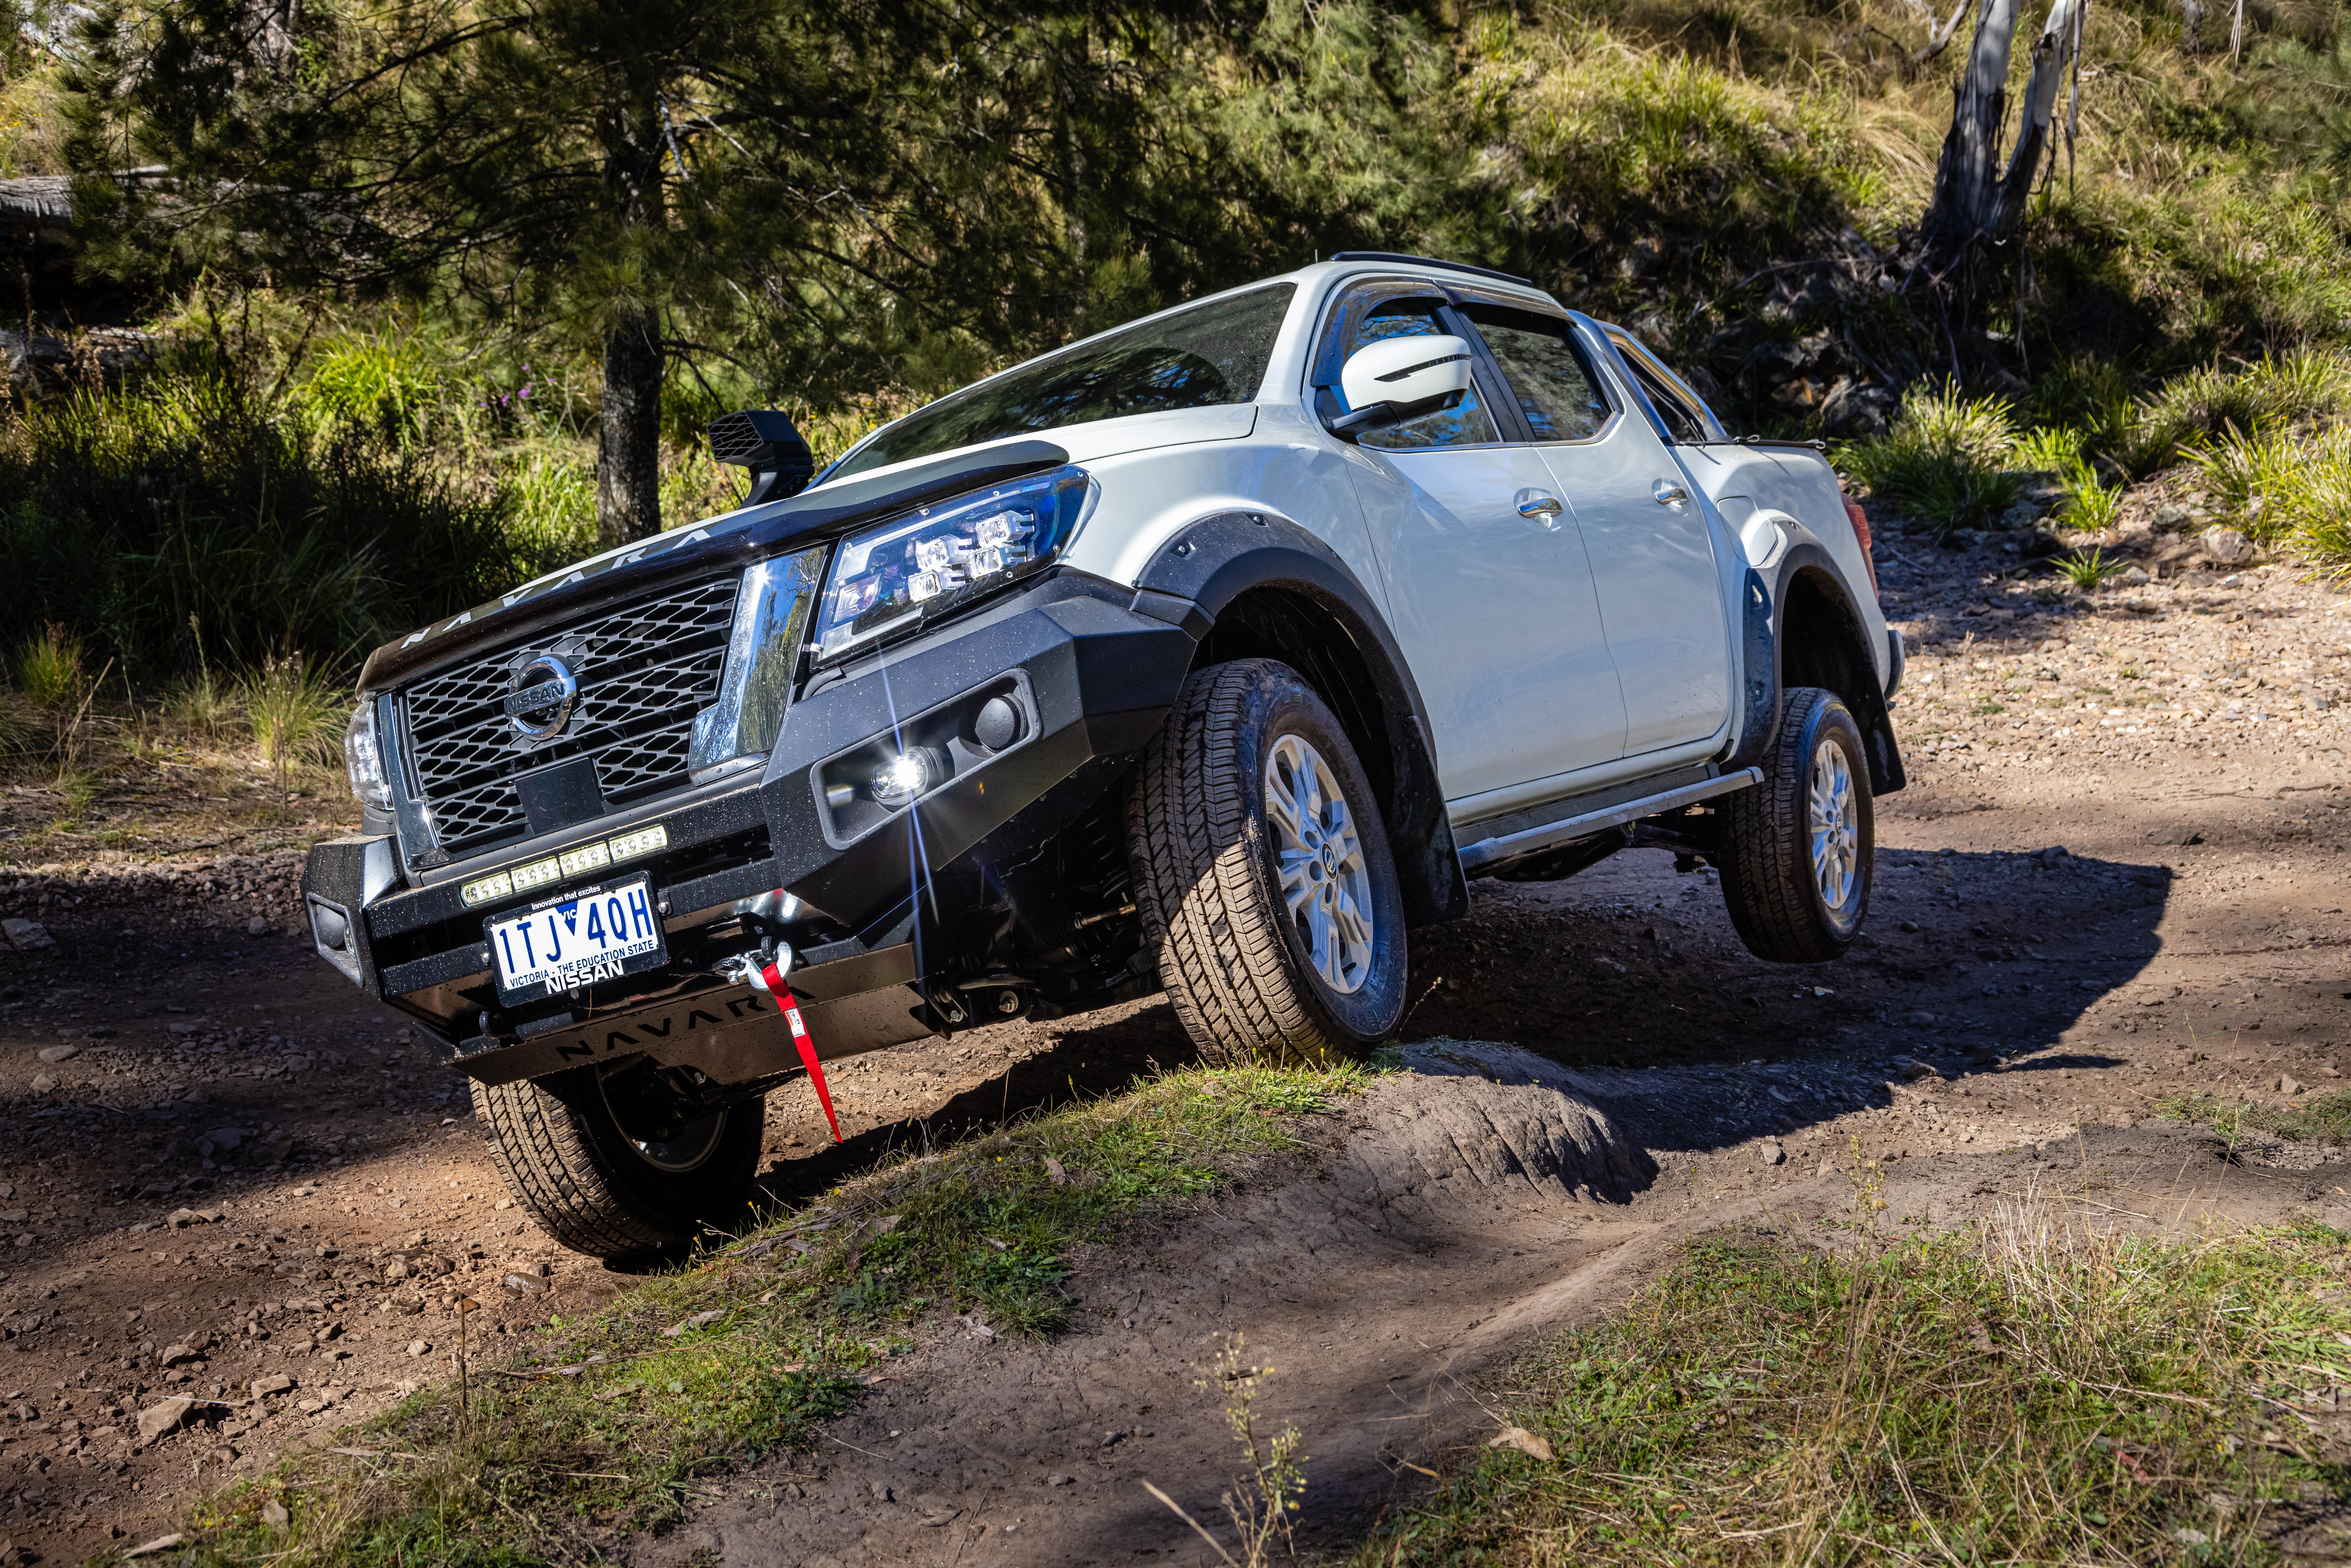 4 X 4 Australia Reviews 2021 June 2021 2021 Nissan Navara With Accessories 17